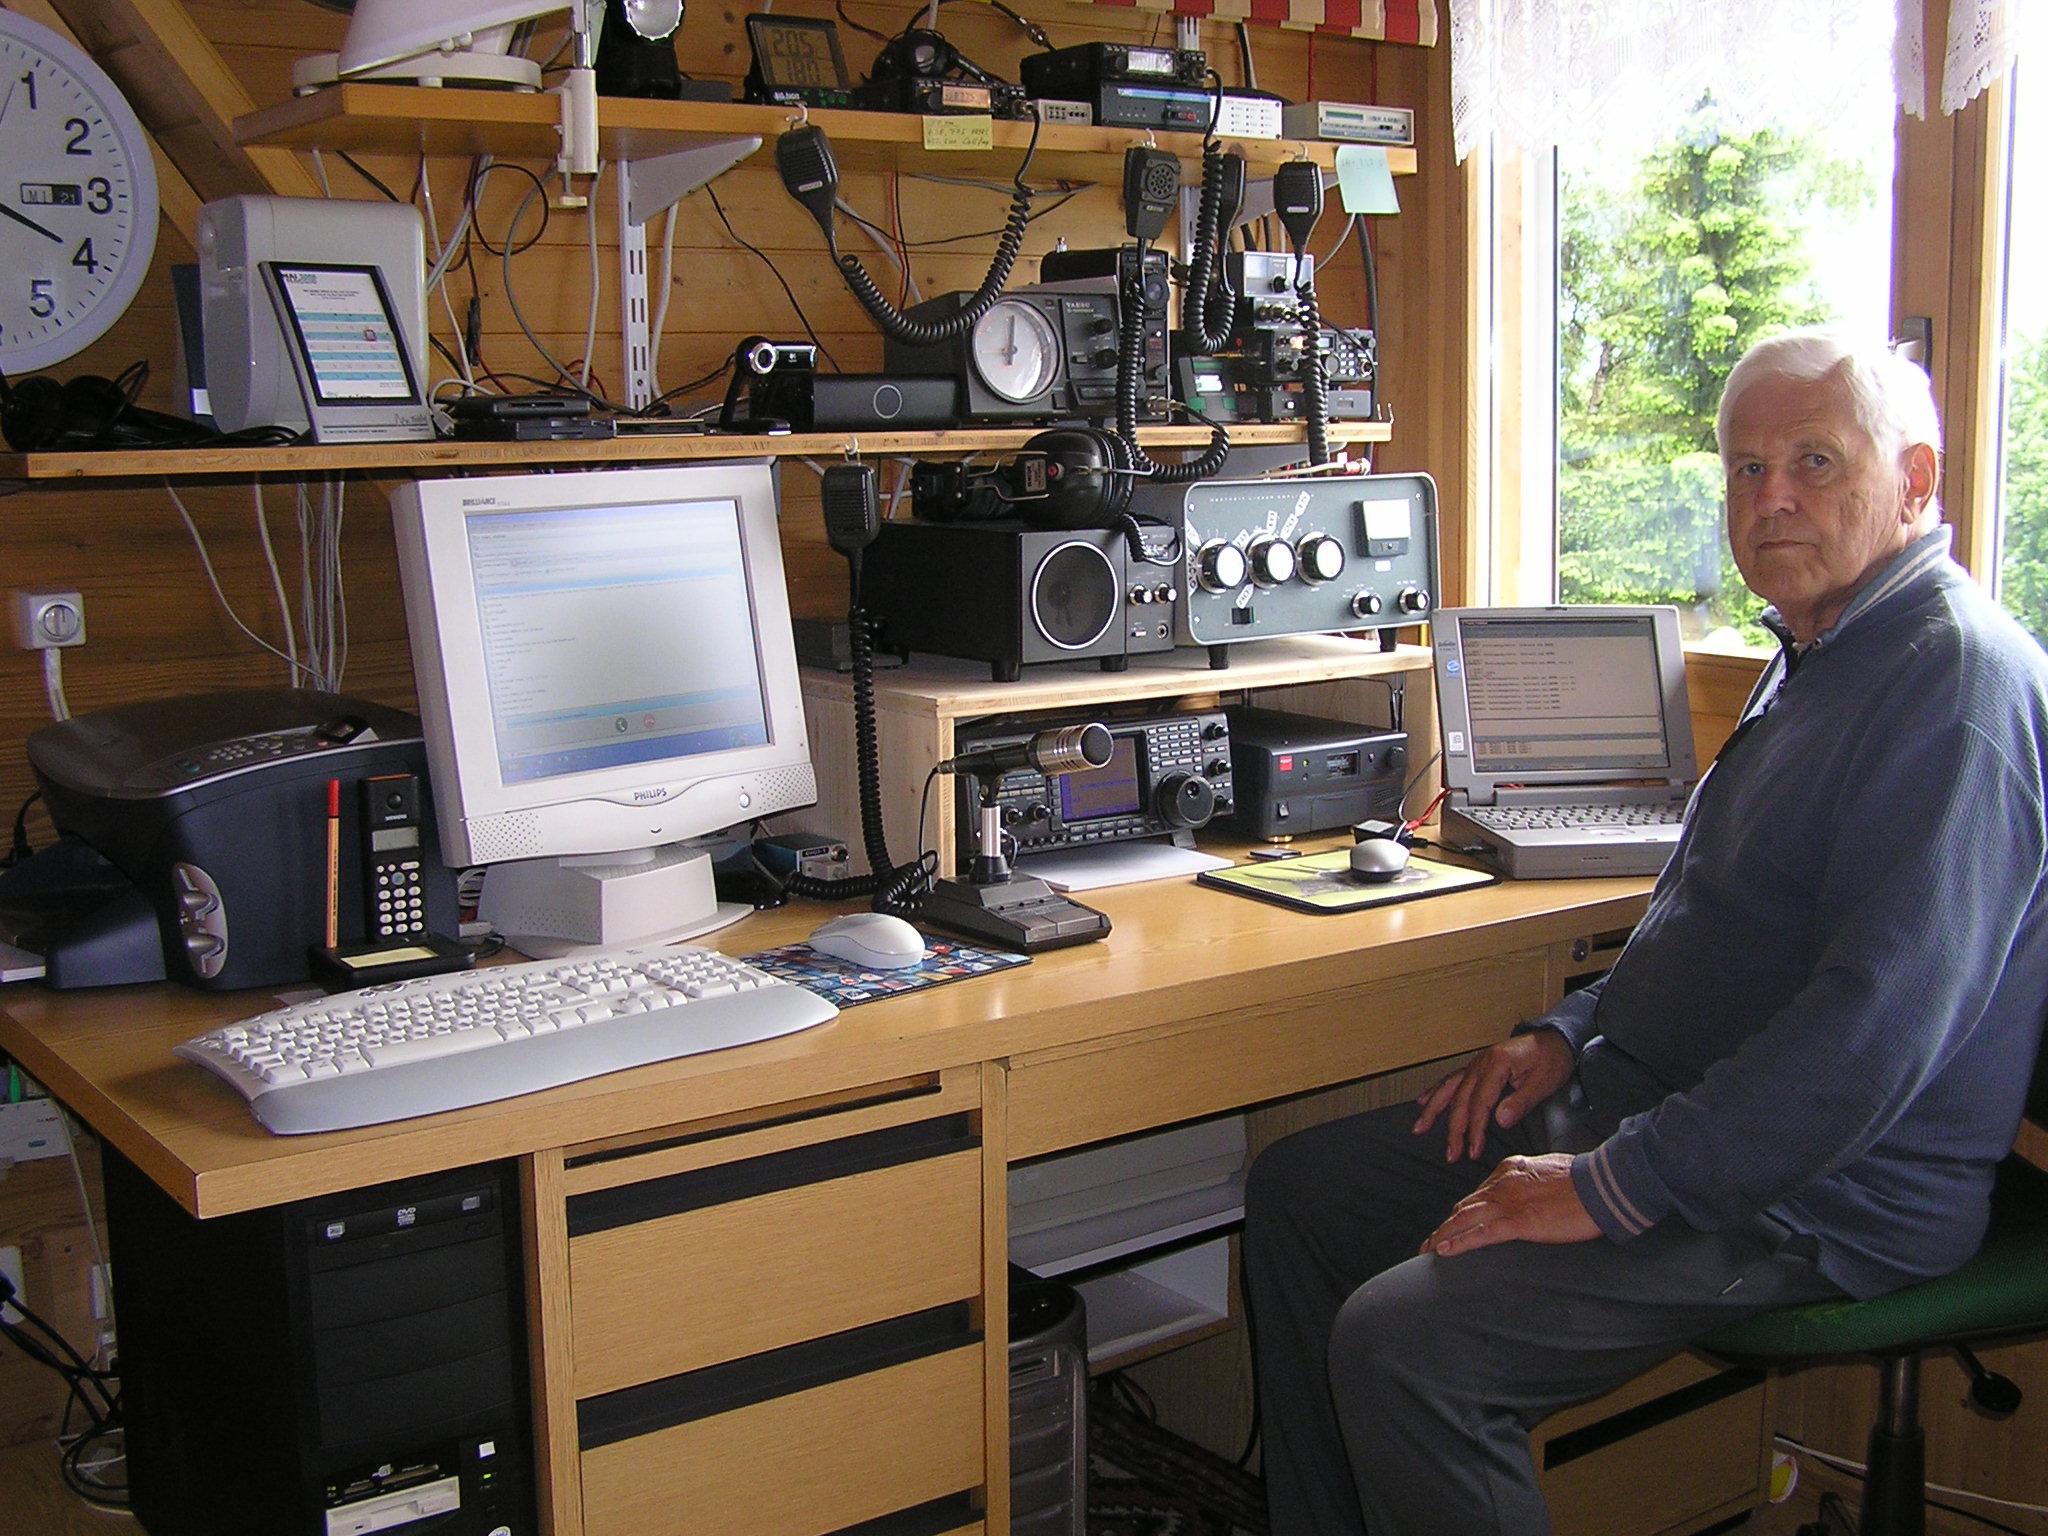 Amateur Radio Station Wb4omm: Amateur Radio Station HB9BZX